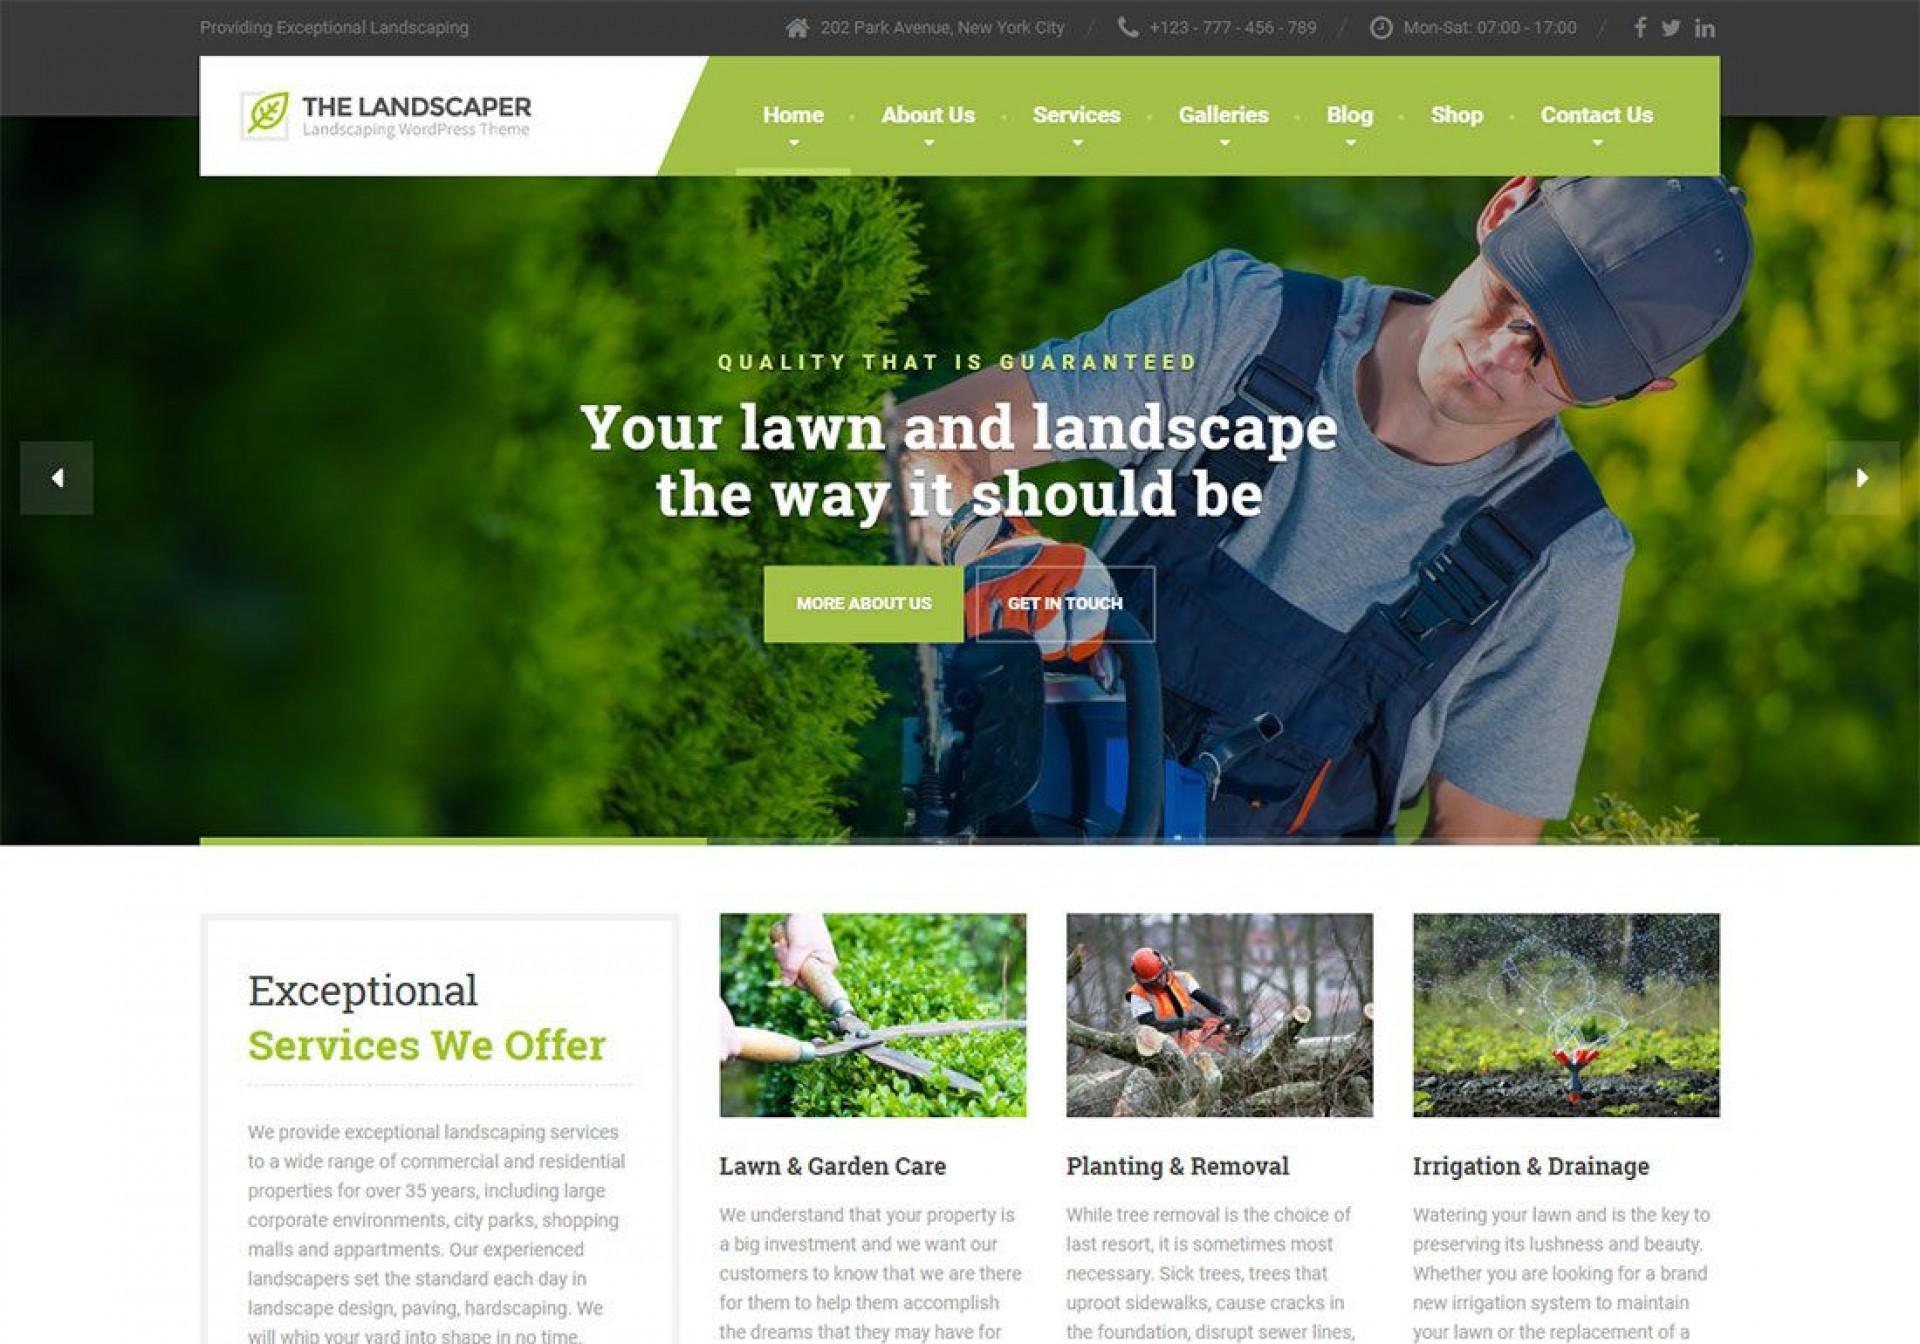 001 Unbelievable Lawn Care Website Template High Definition 1920